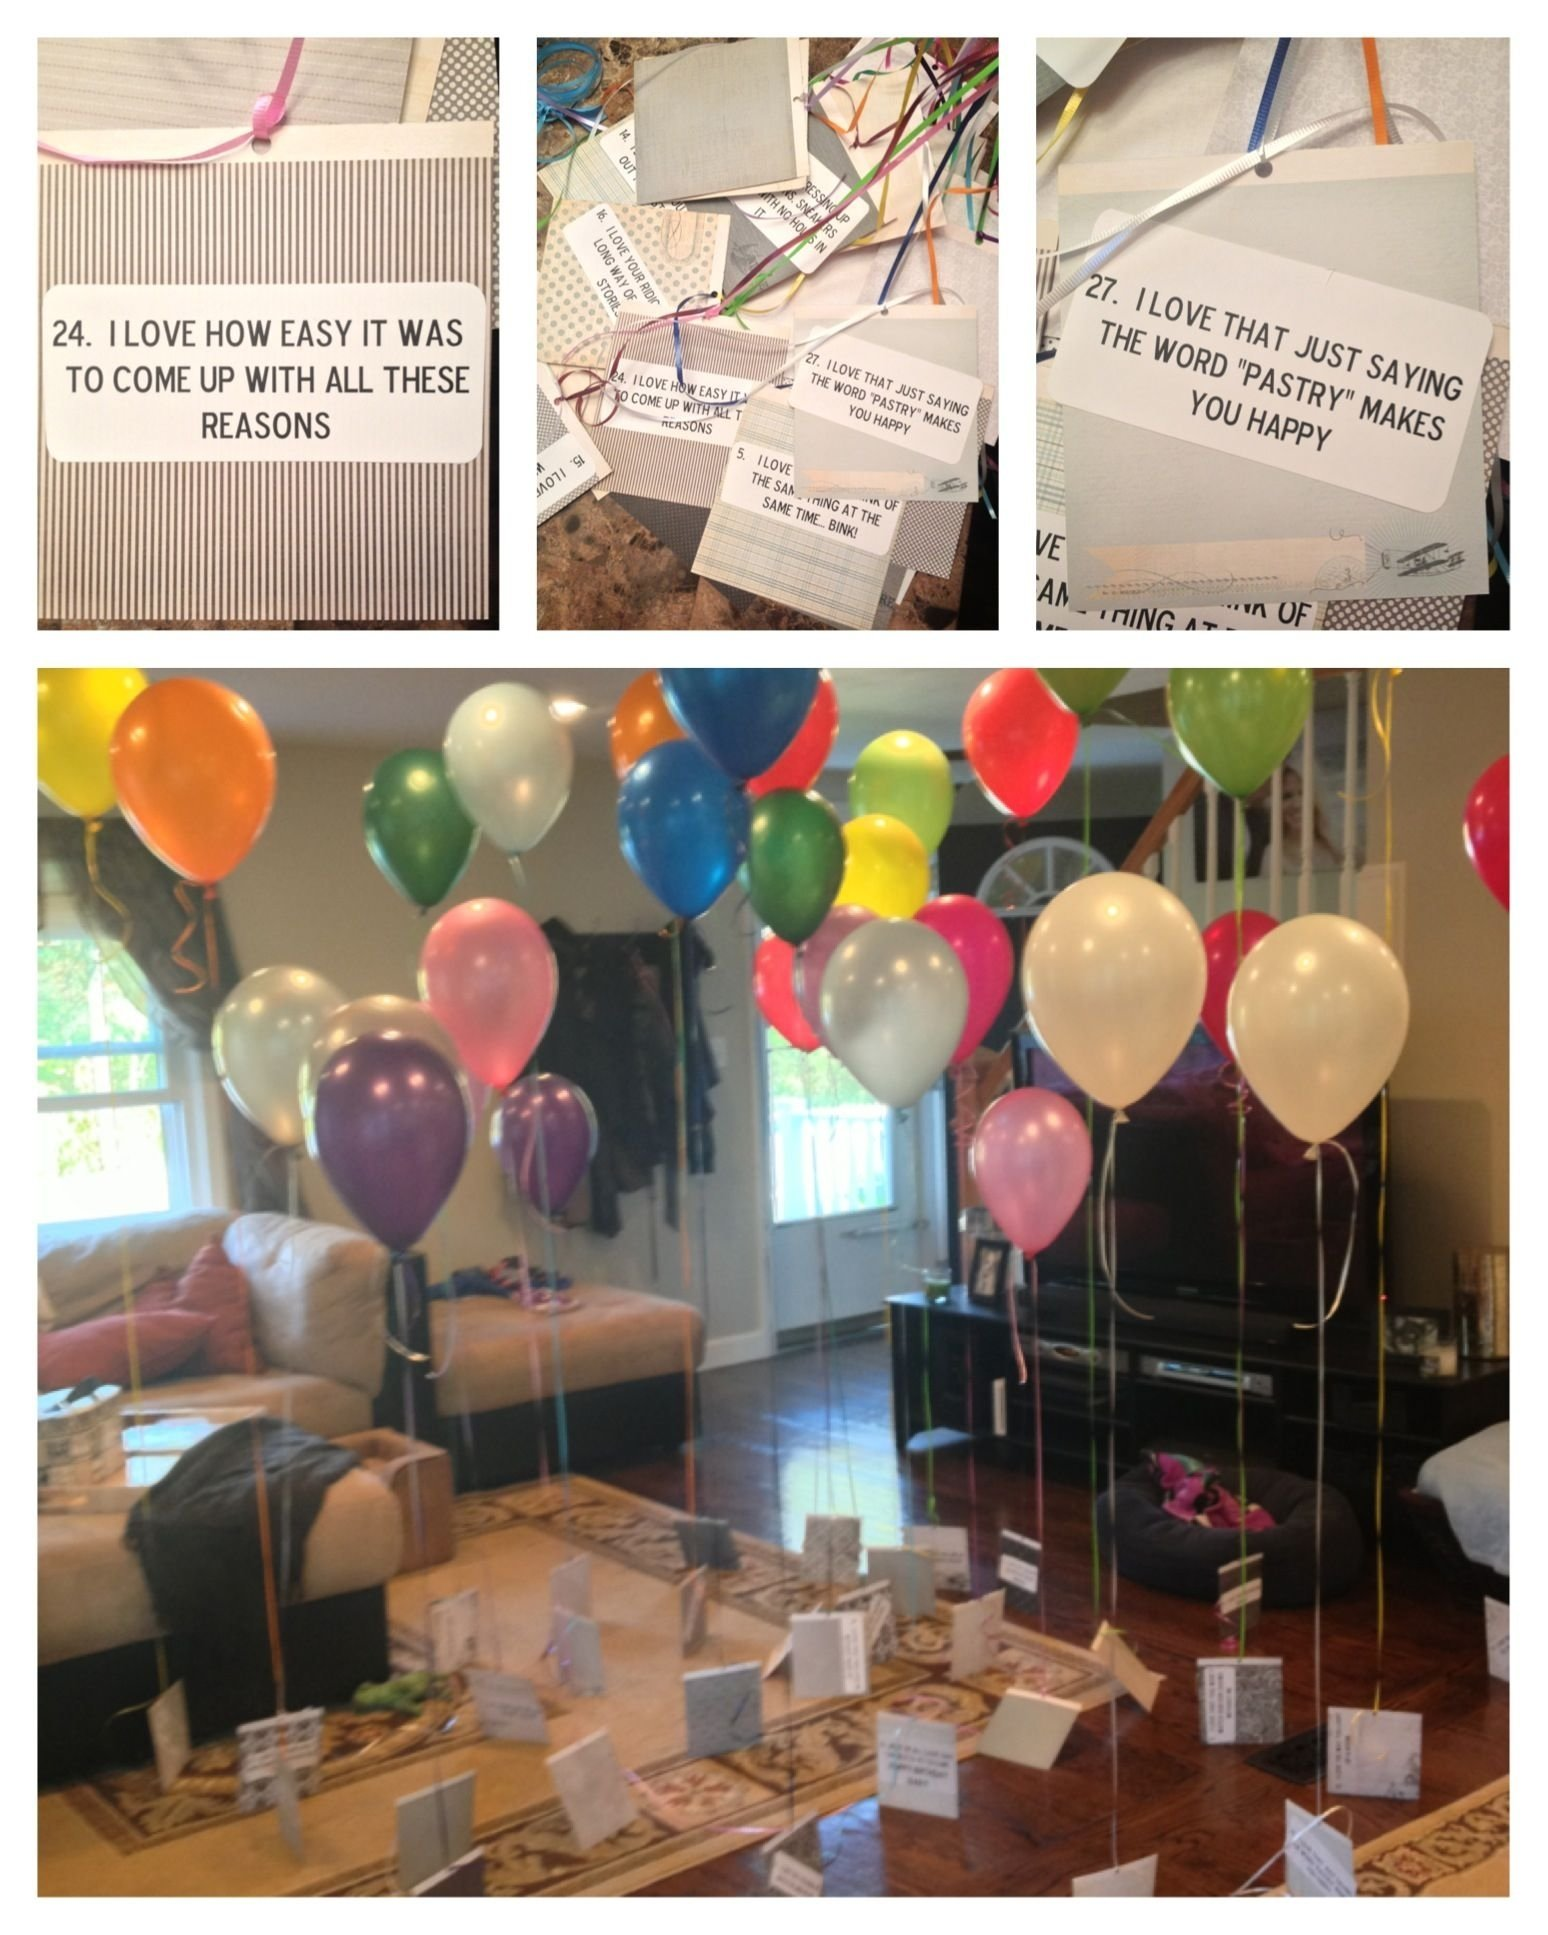 10 Nice Fun Birthday Ideas For Husband 31 Reasons Why I Love You My Husbands